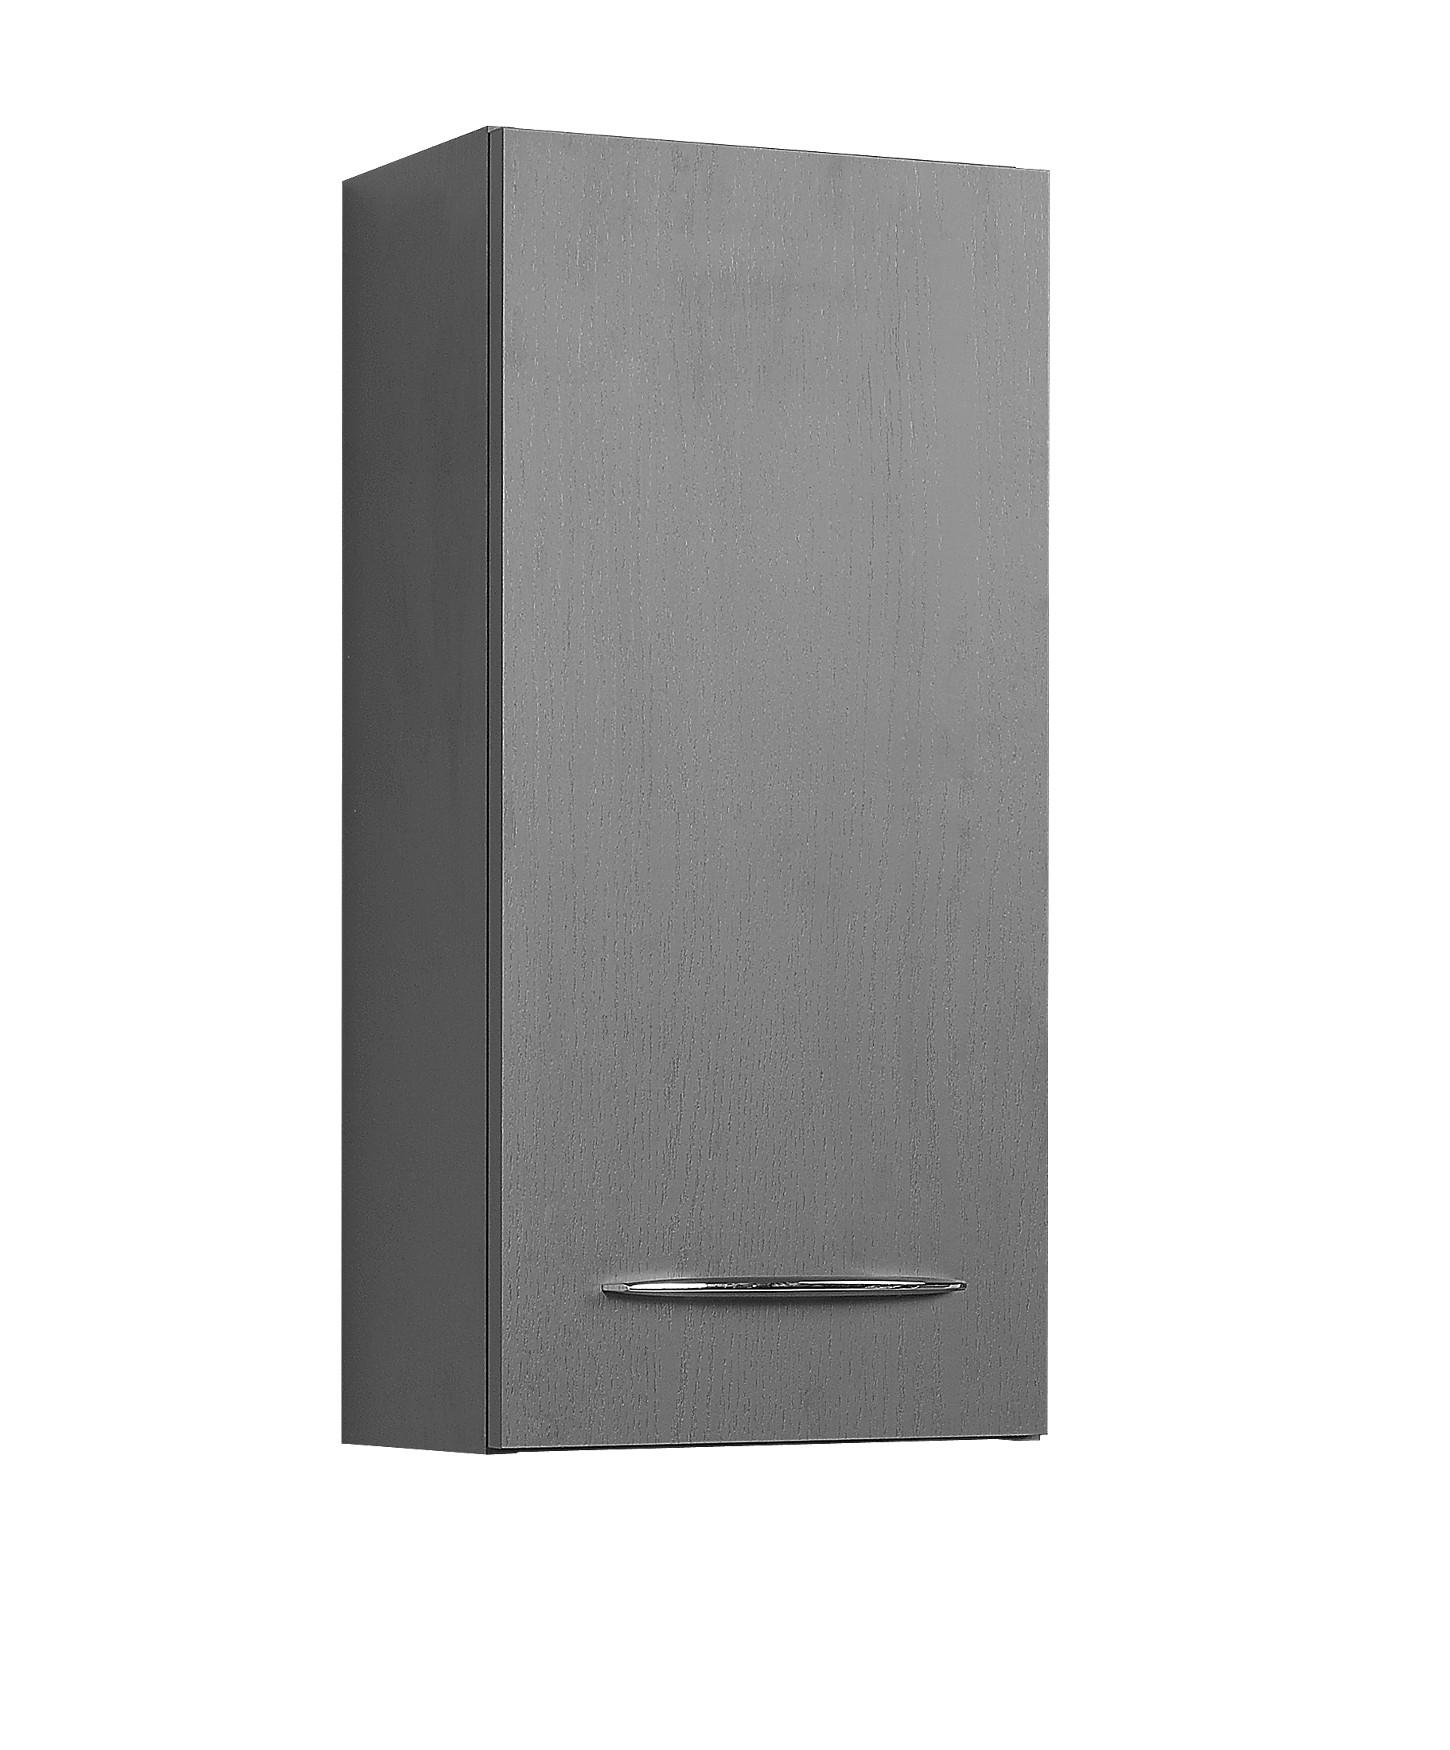 Badezimmer h ngeschrank portofino badschrank badezimmerschrank 30cm graphit grau ebay - Badezimmerschrank grau ...